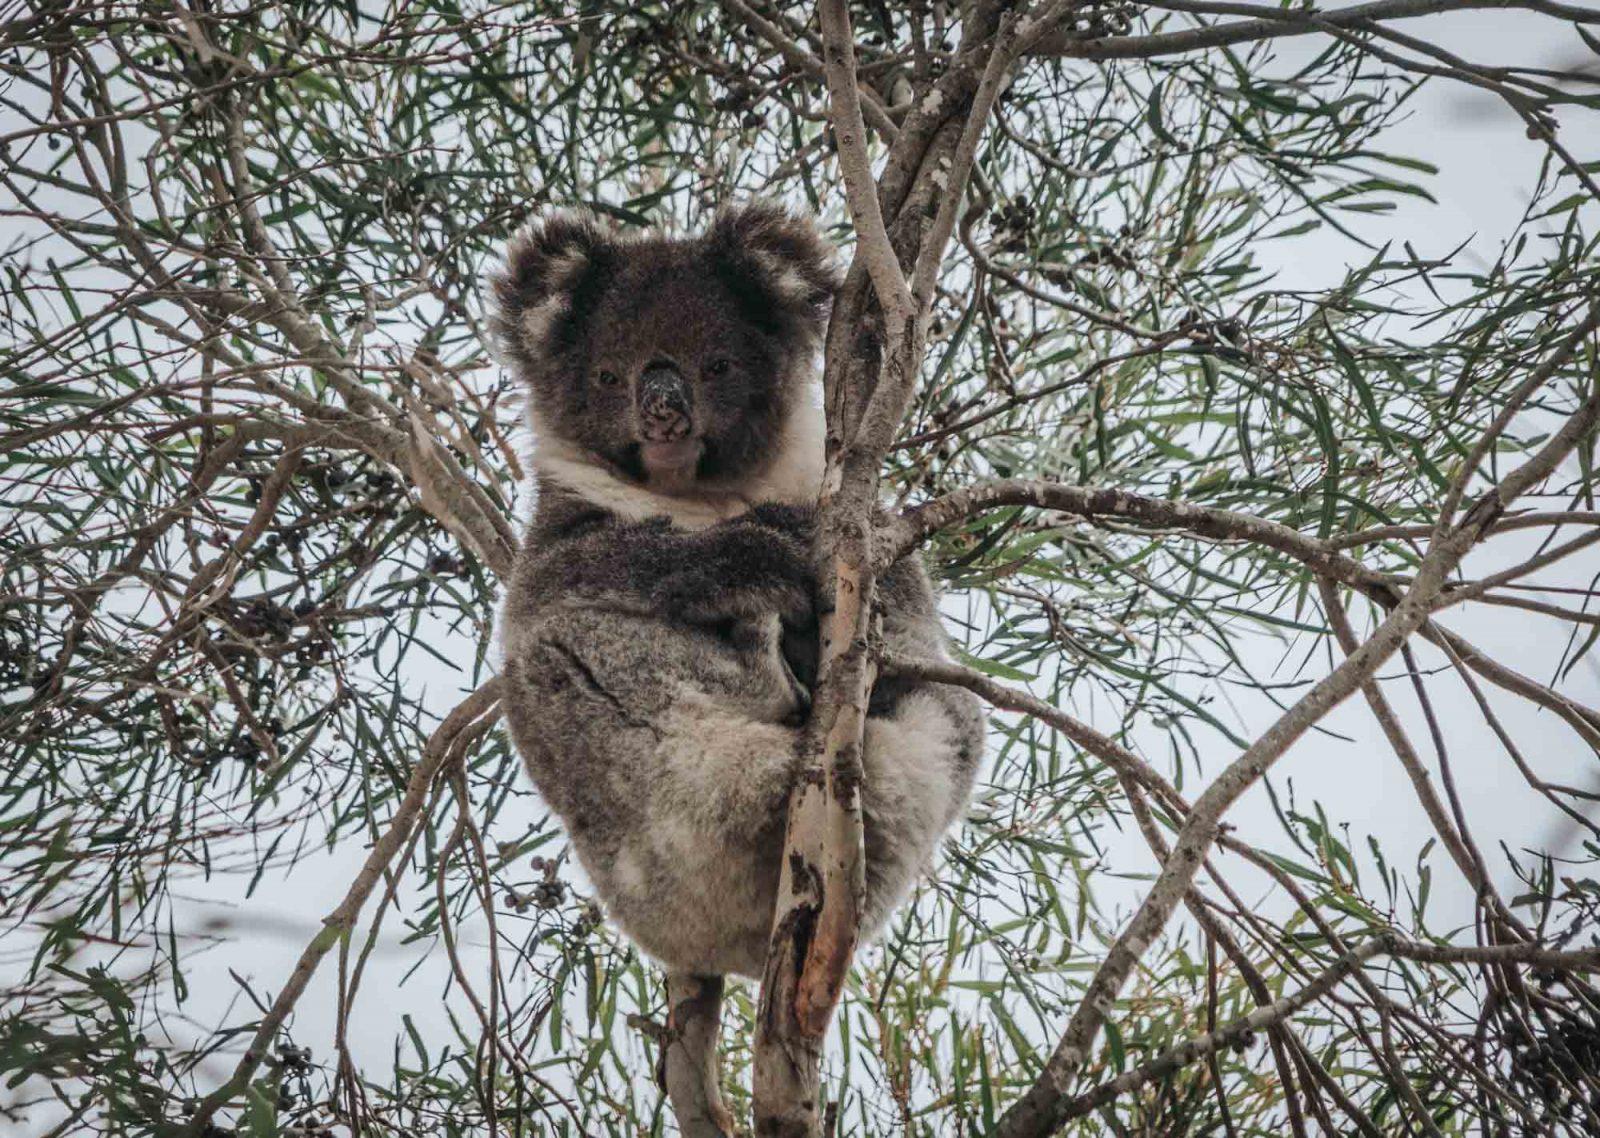 romantic getaways Australia that you should experience